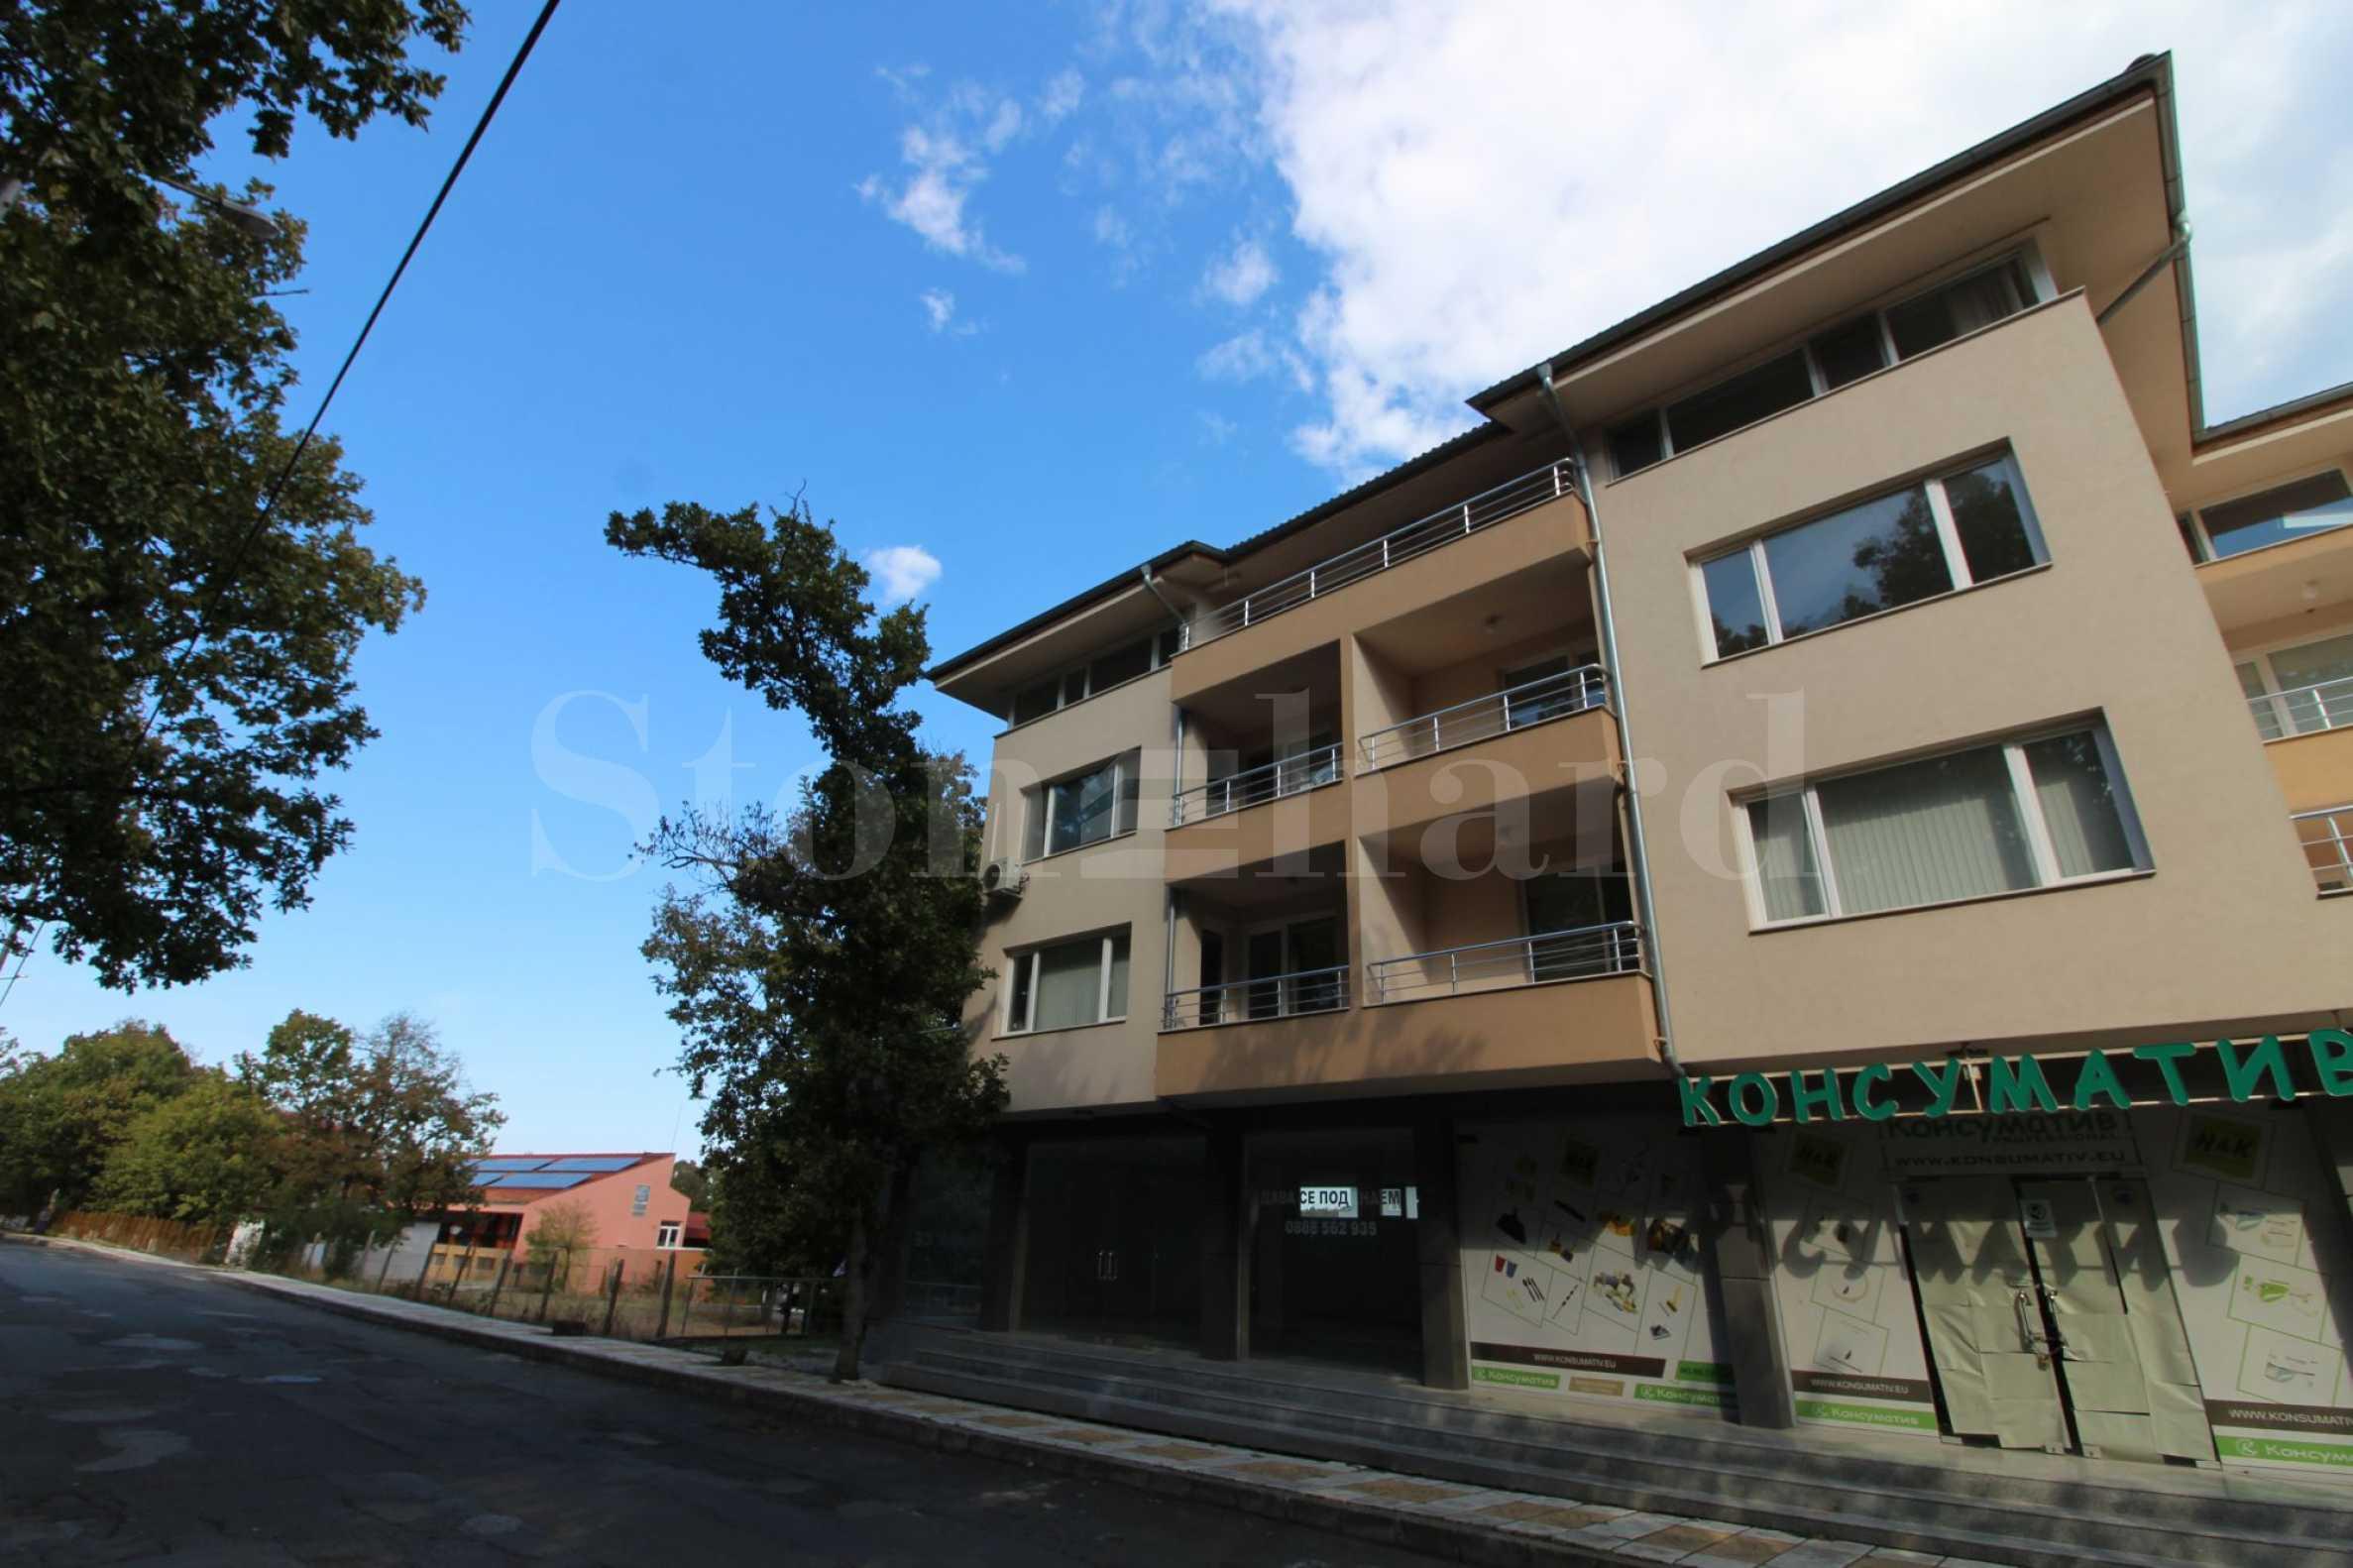 Turnkey apartments near Atliman beach1 - Stonehard